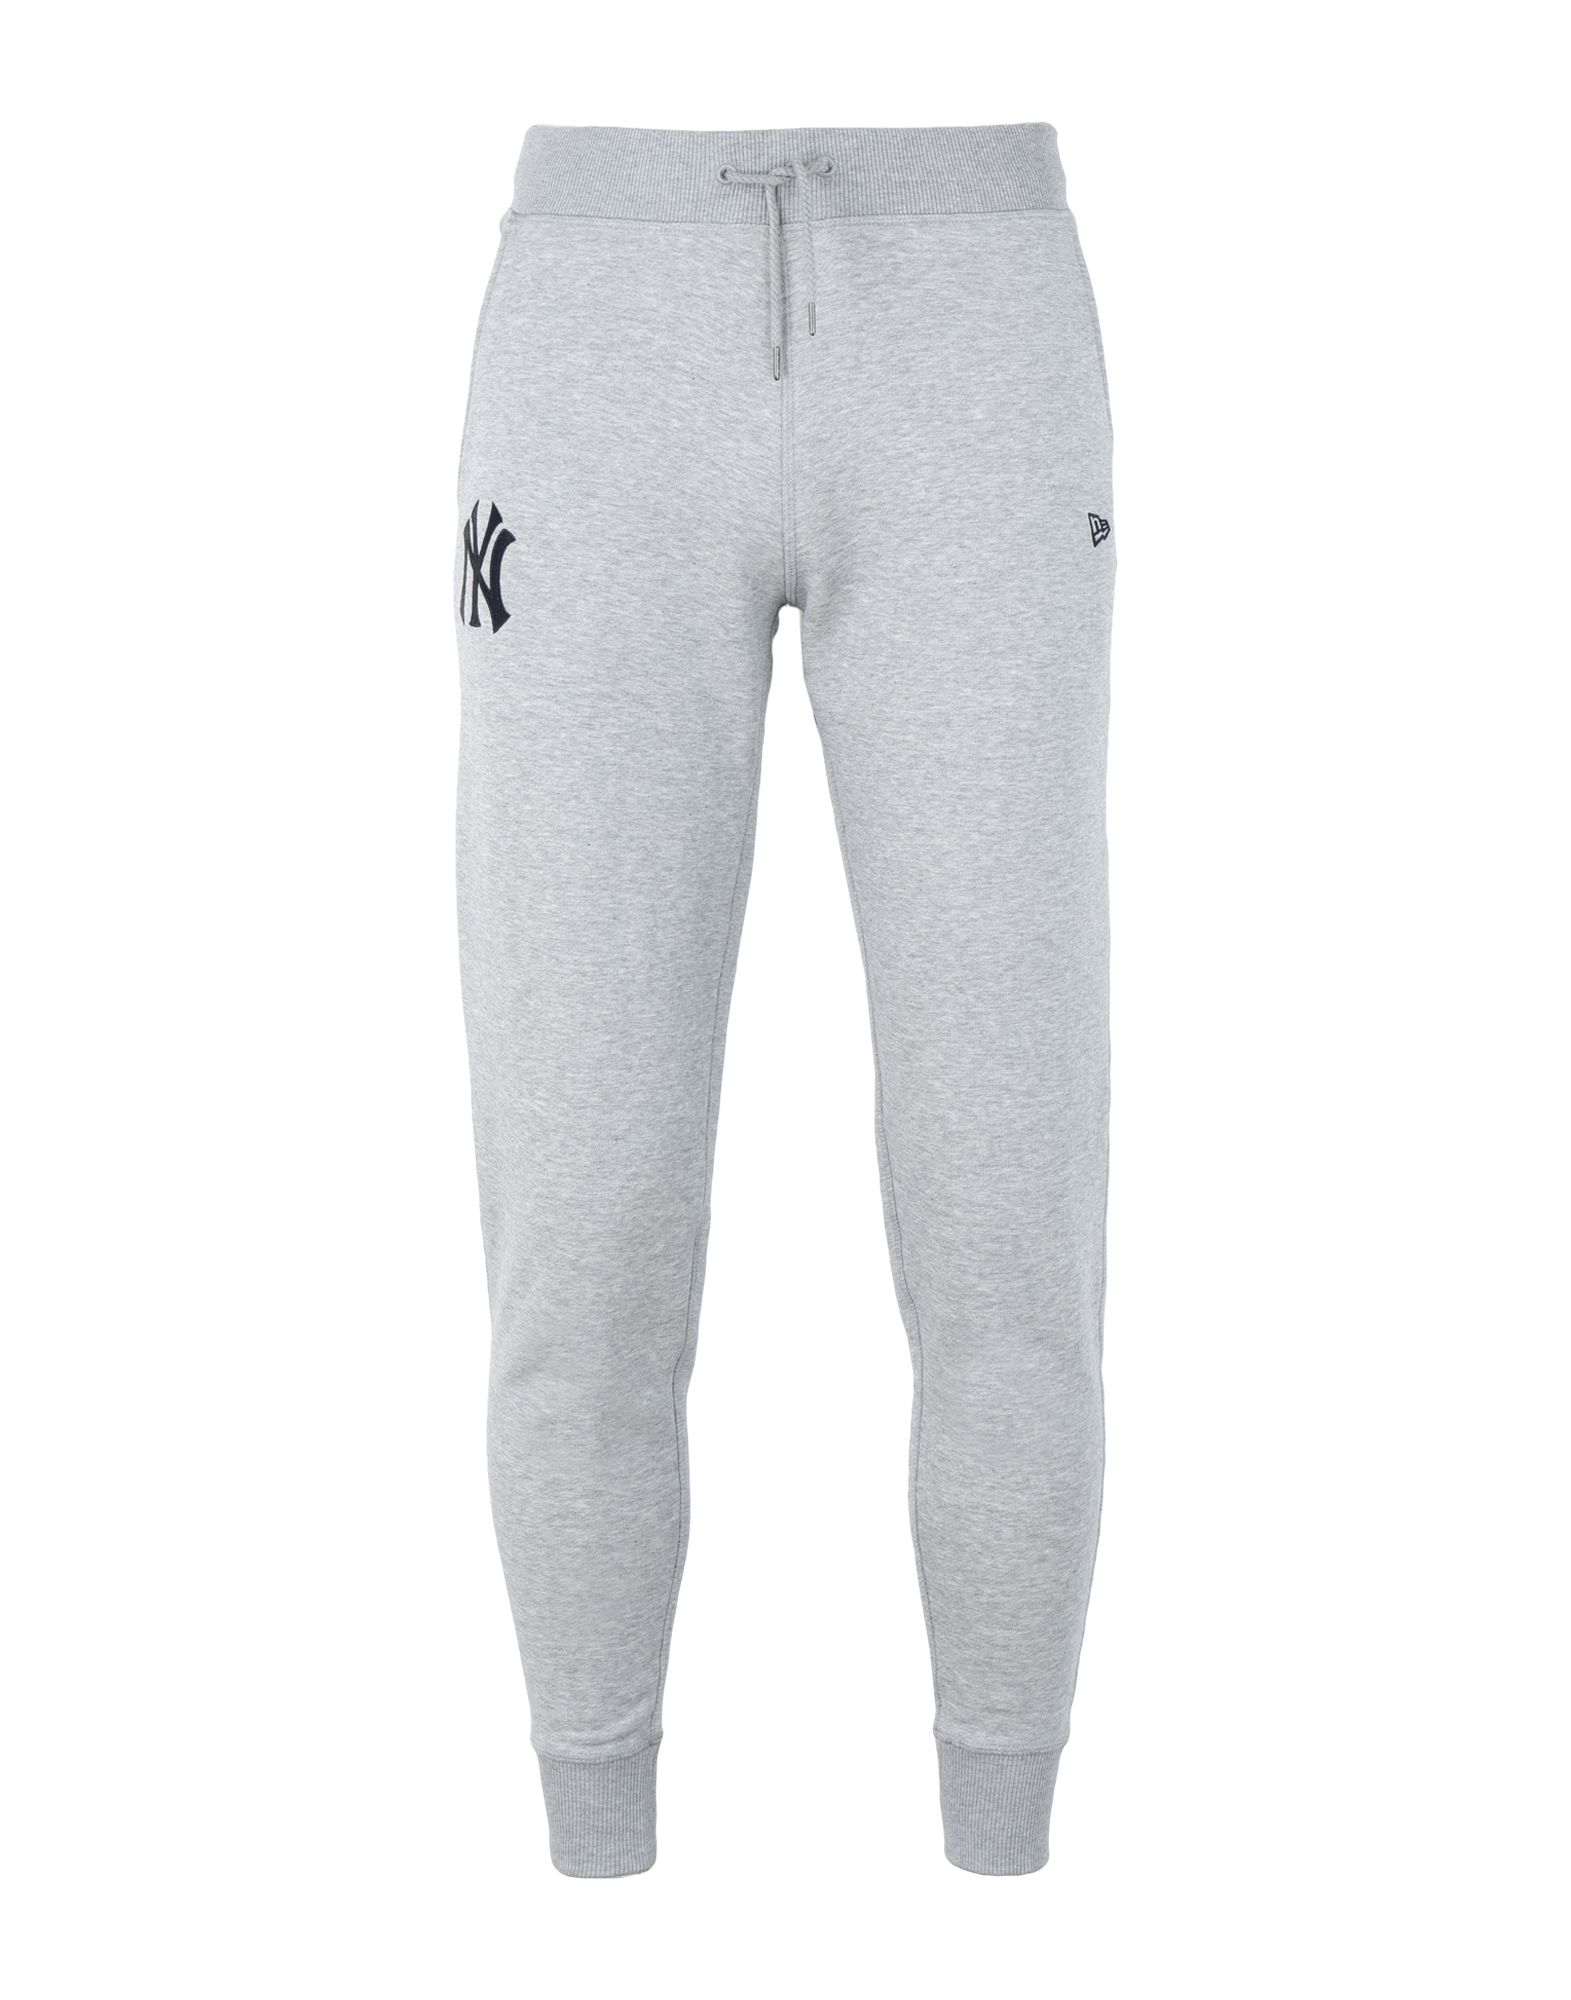 Pantalone New Era Post Grad Pack Jogger - herren - 13245469KH